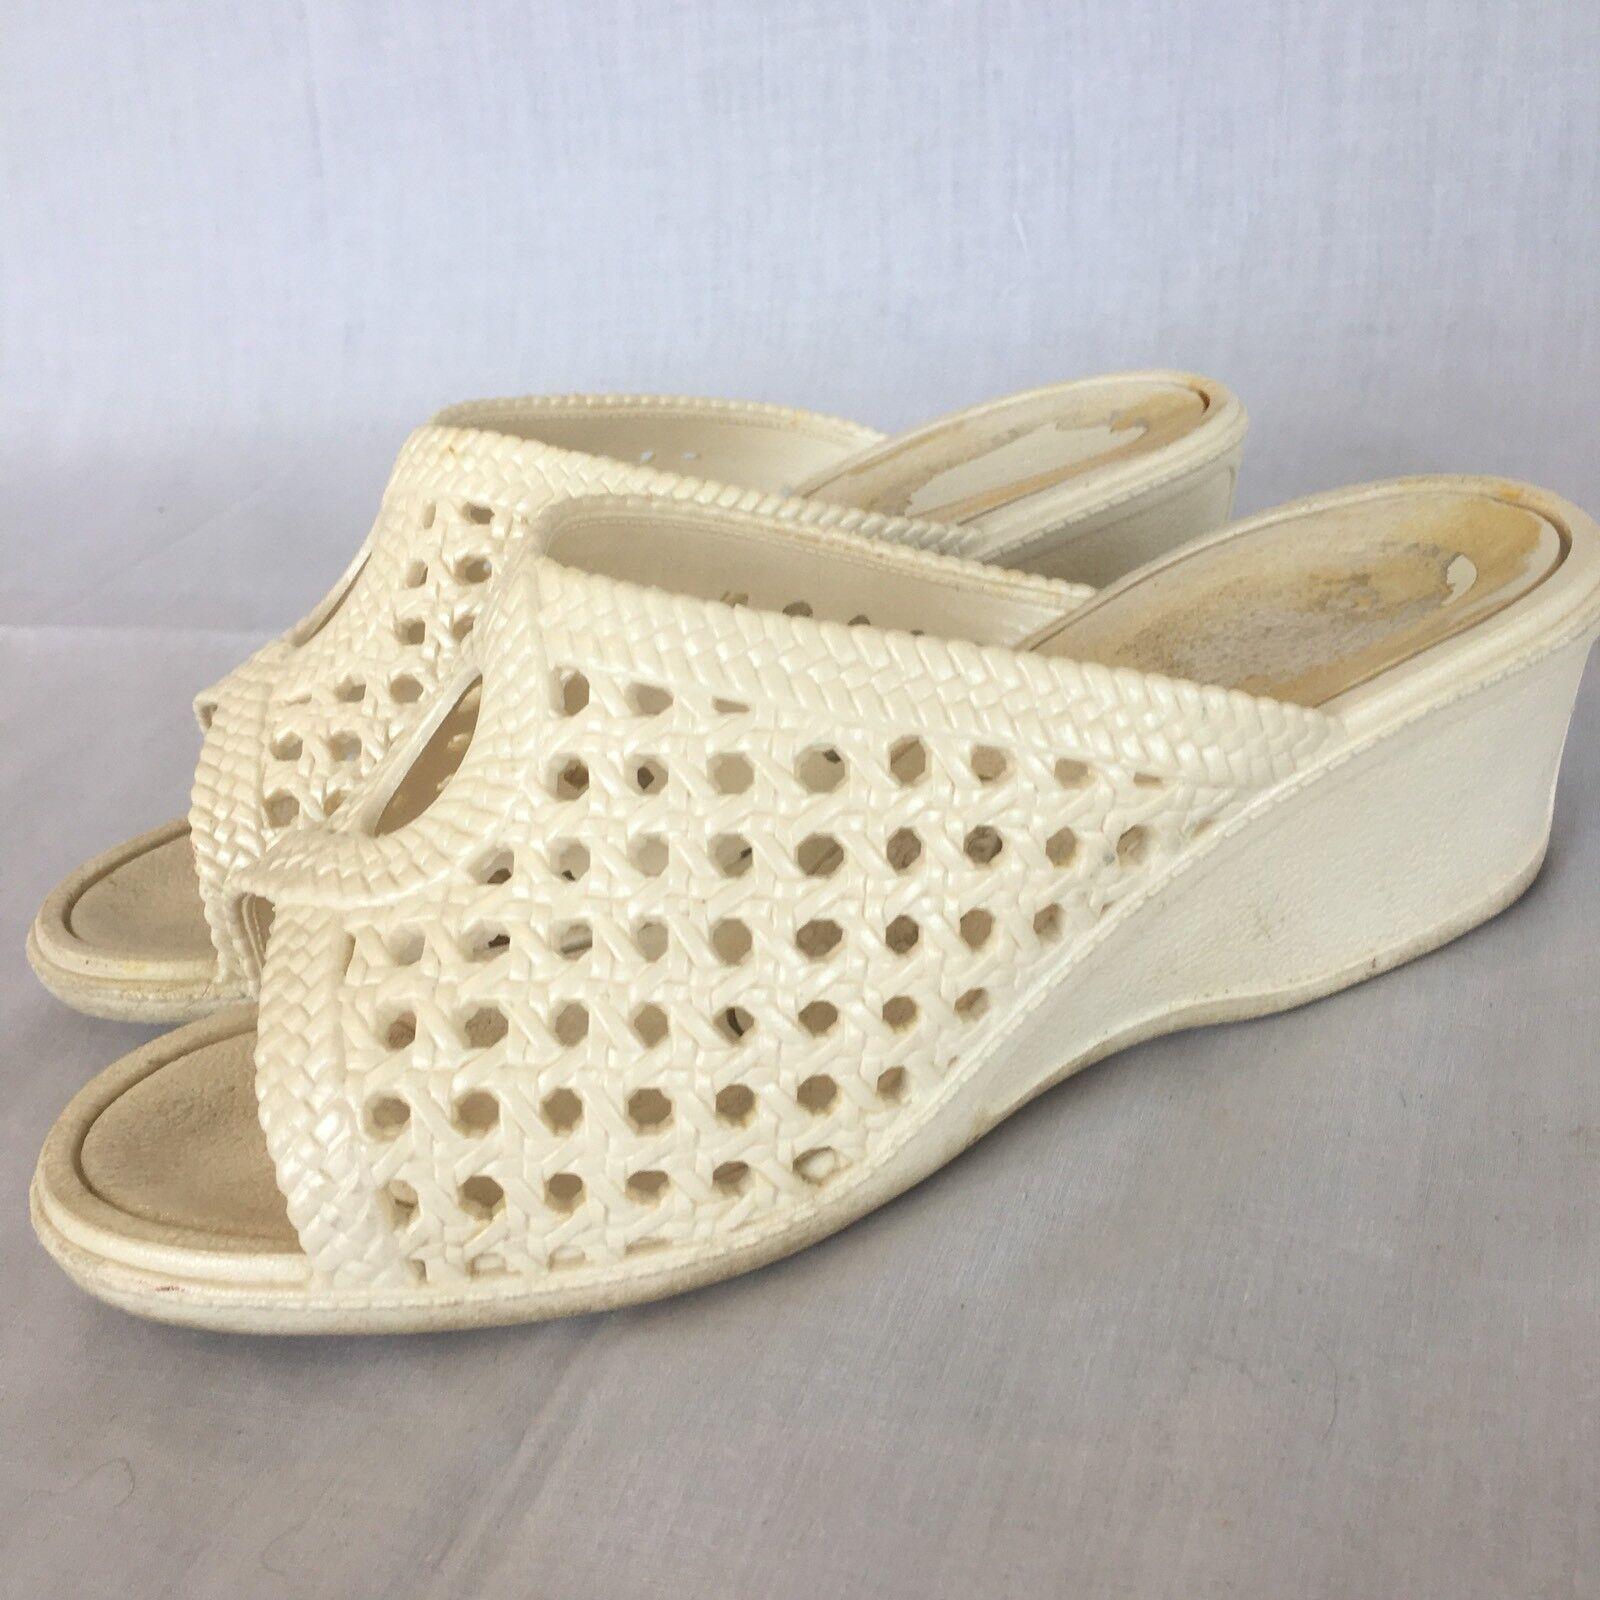 Vintage White OTAFUKU Large Sandal Shoes White Vintage Japan Therapy Massage Original Version 46472f